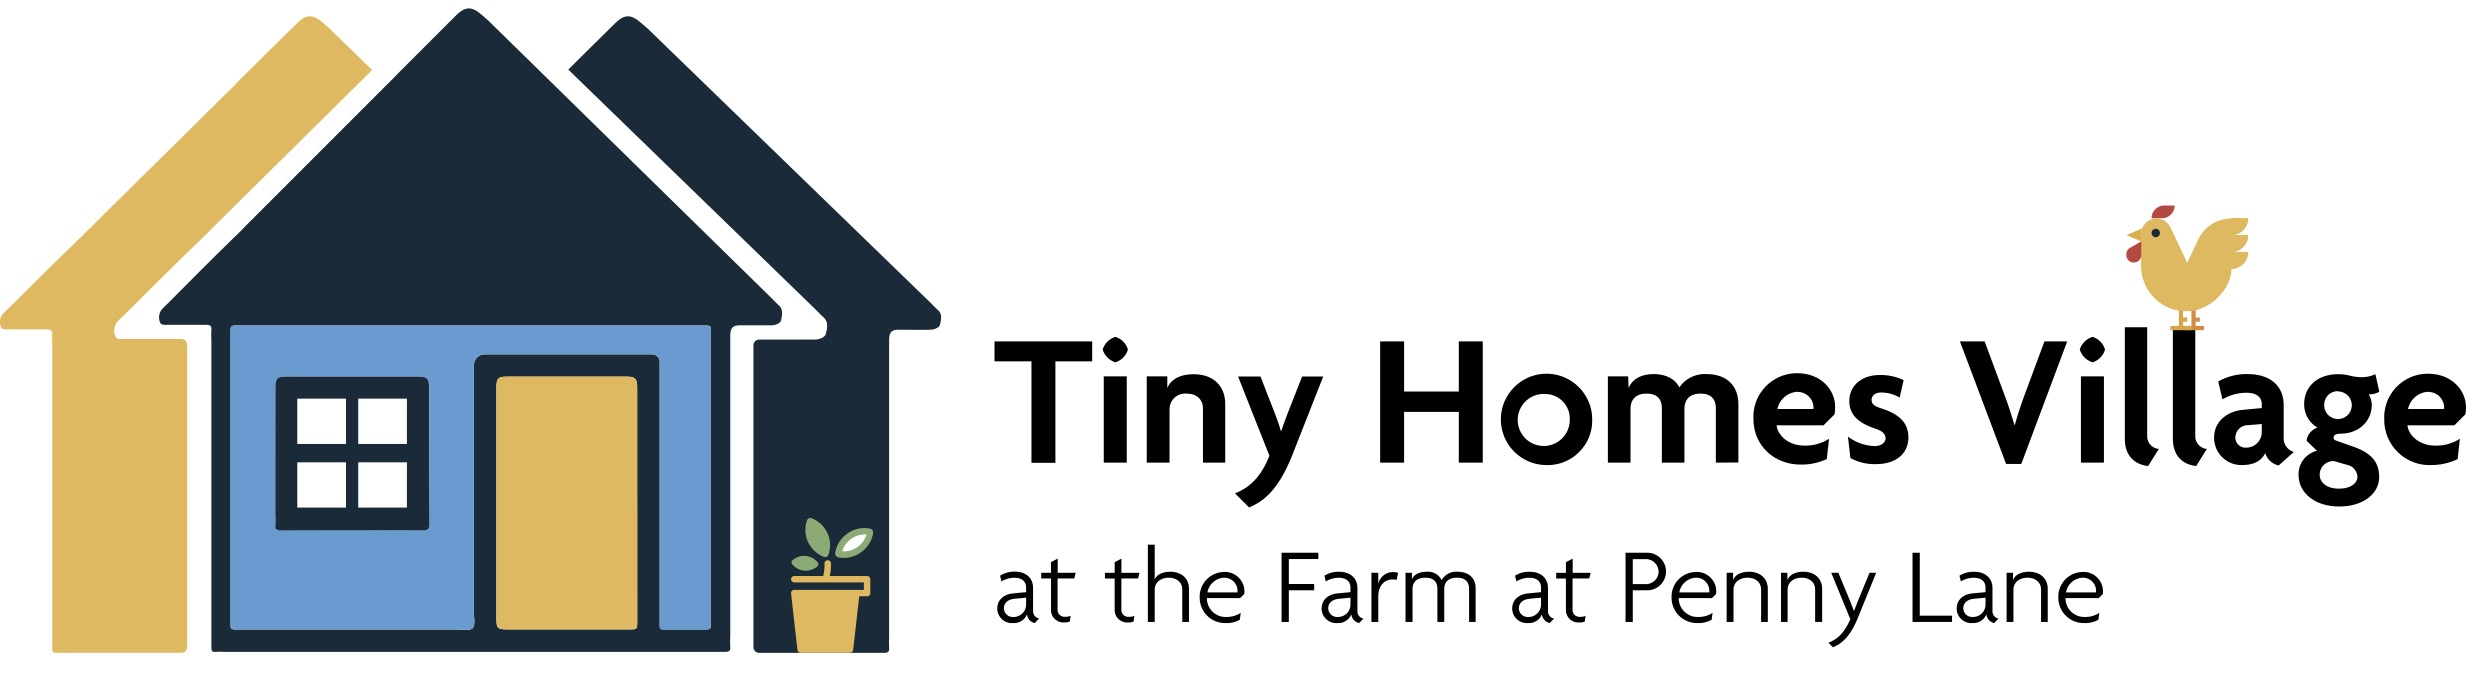 Tiny Homes Village at the Farm at Penny Lane